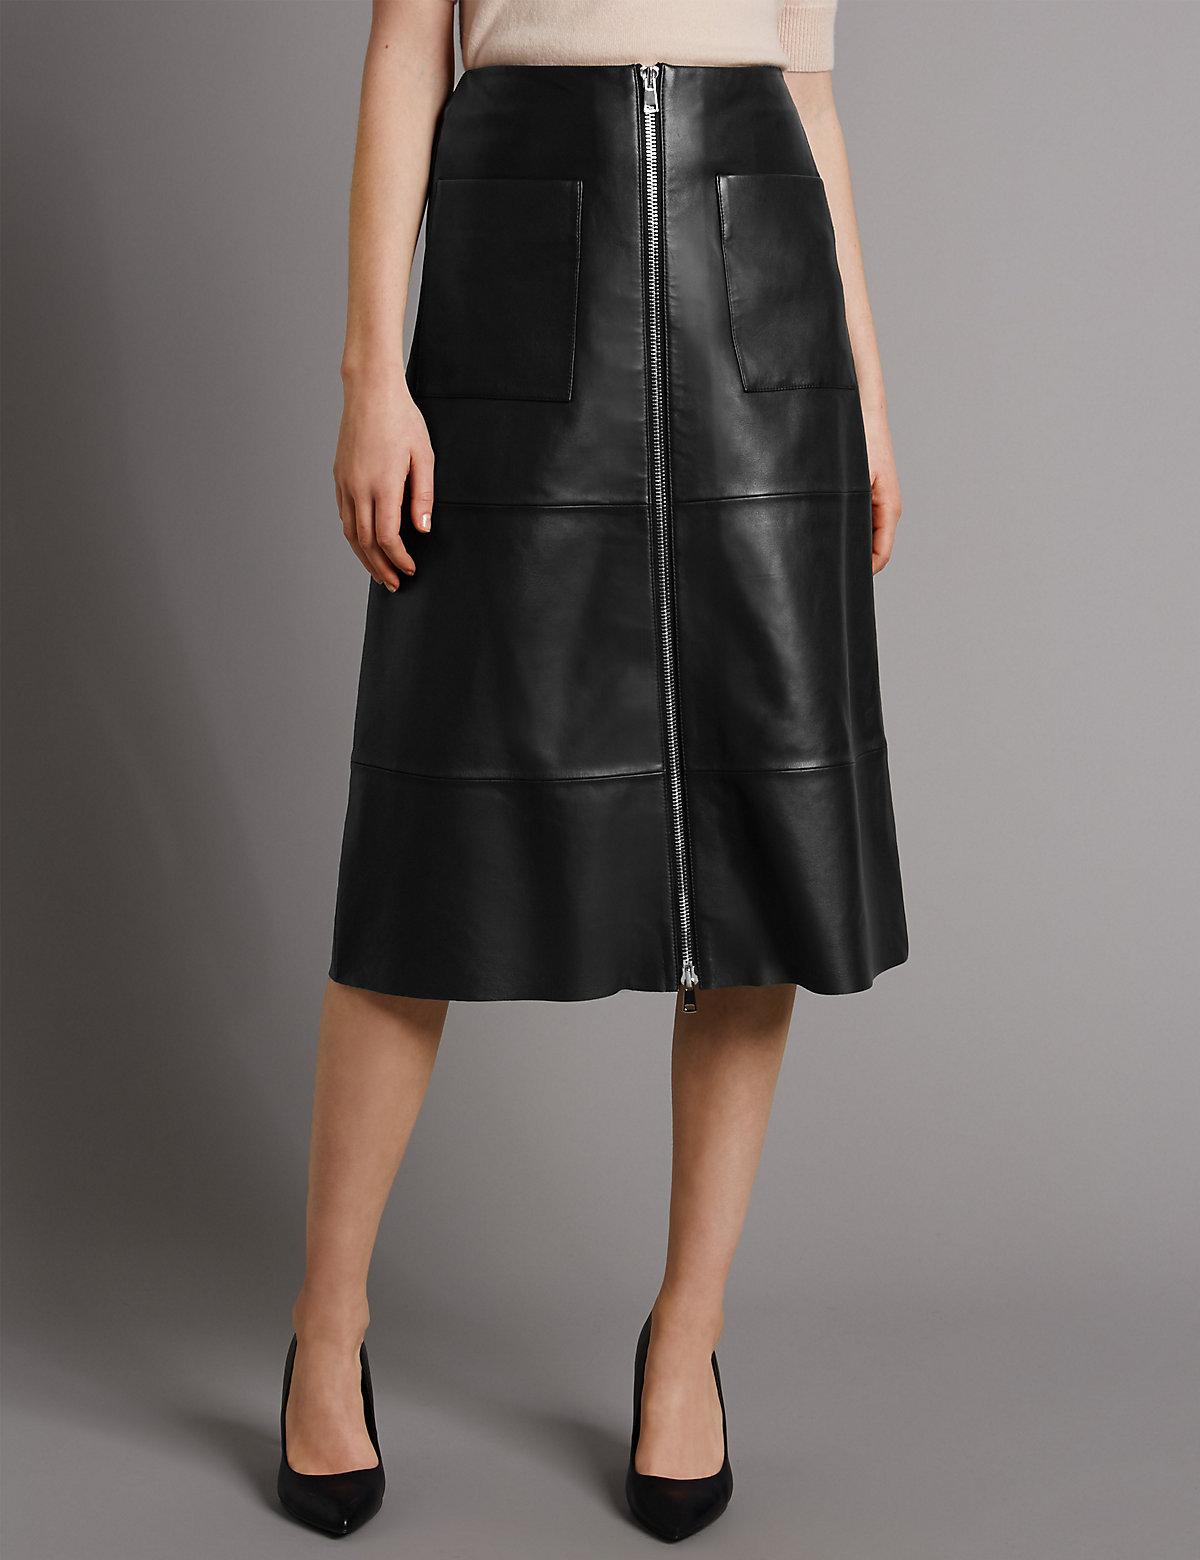 Autograph Pure Leather ALine Skirt